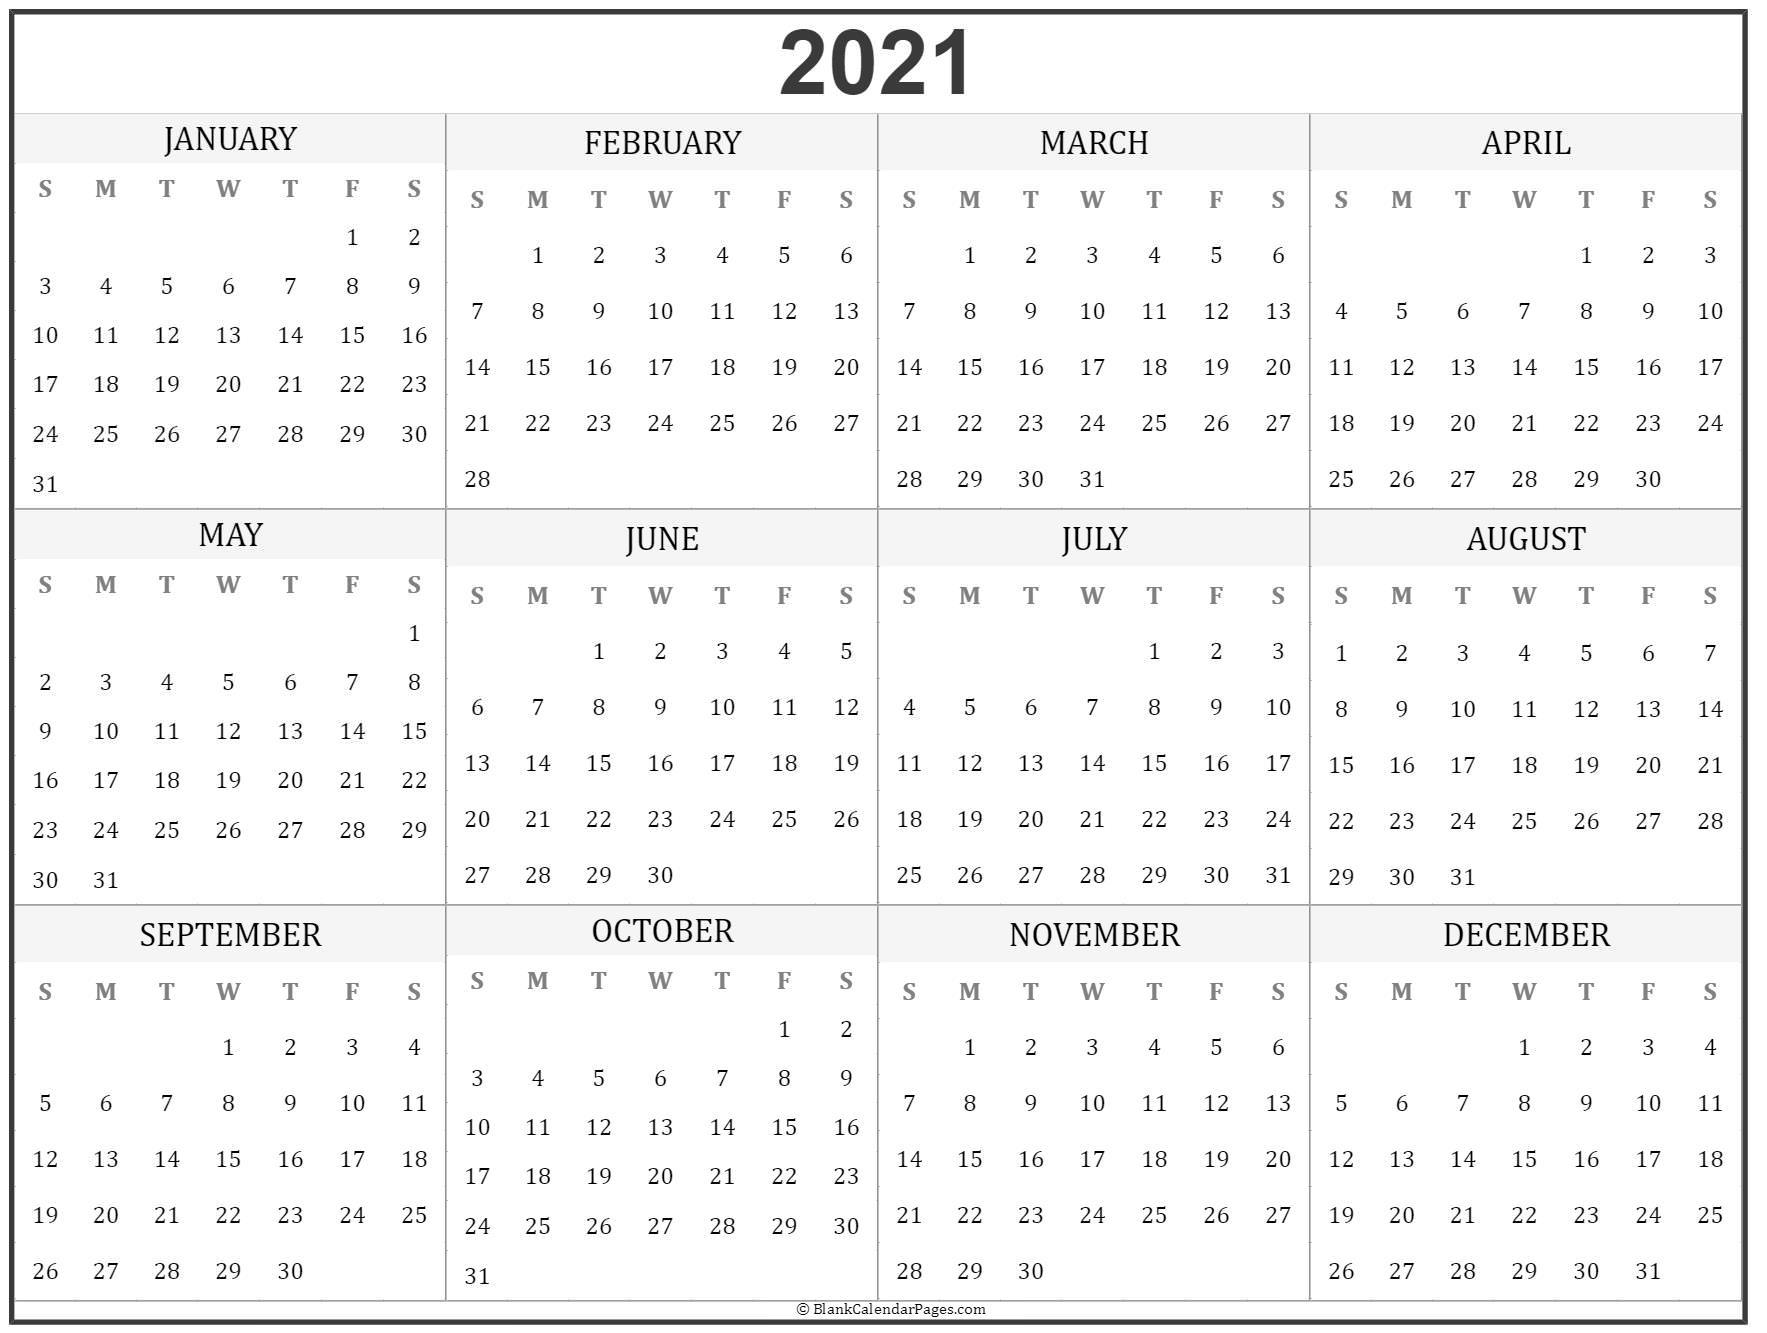 2021 Year Calendar | Yearly Printable